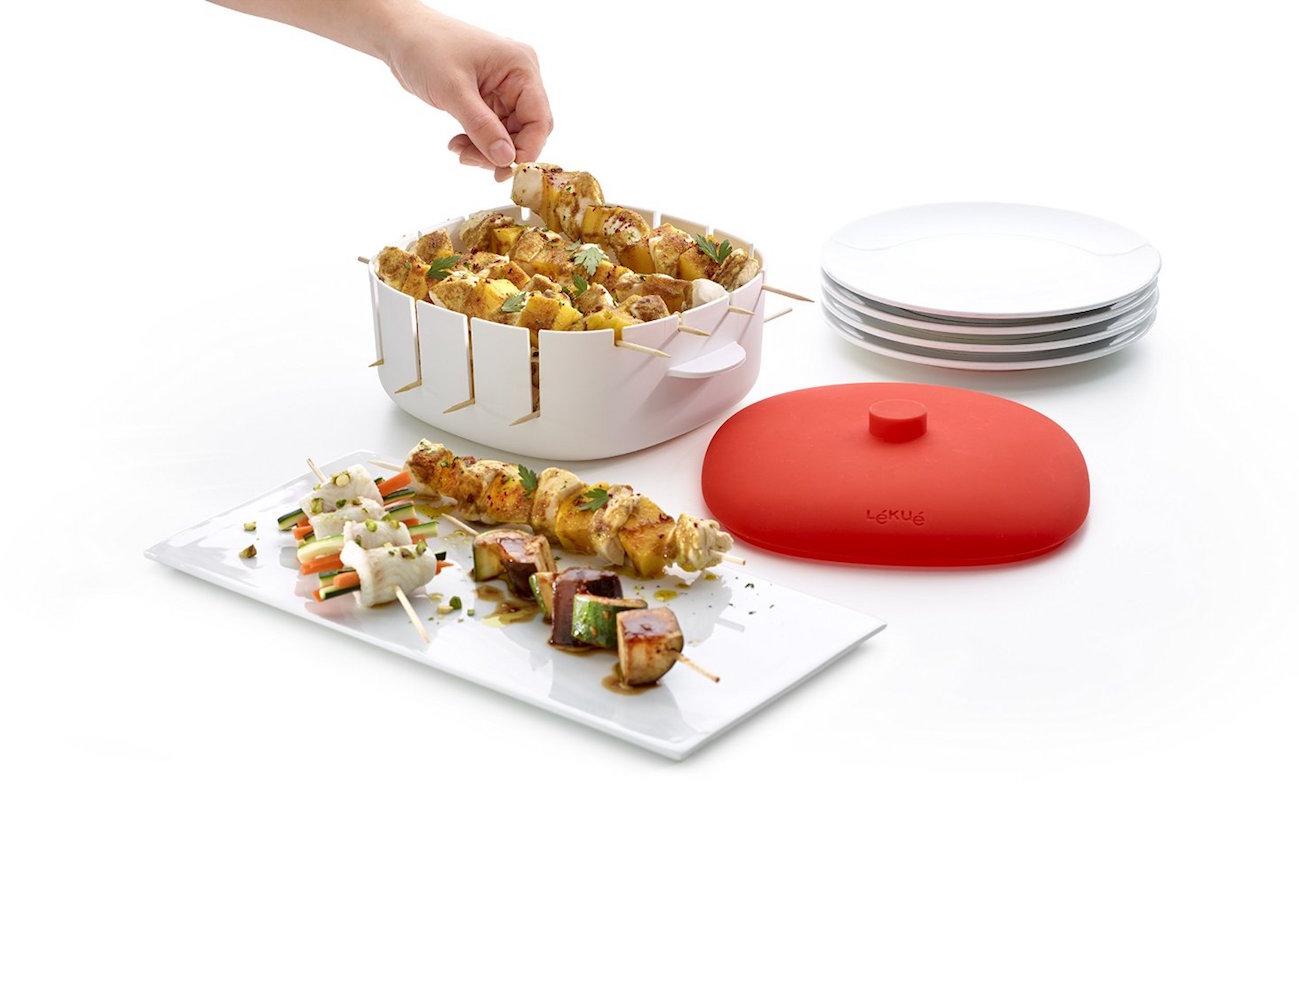 lekue-microwavable-kebob-cooker-02